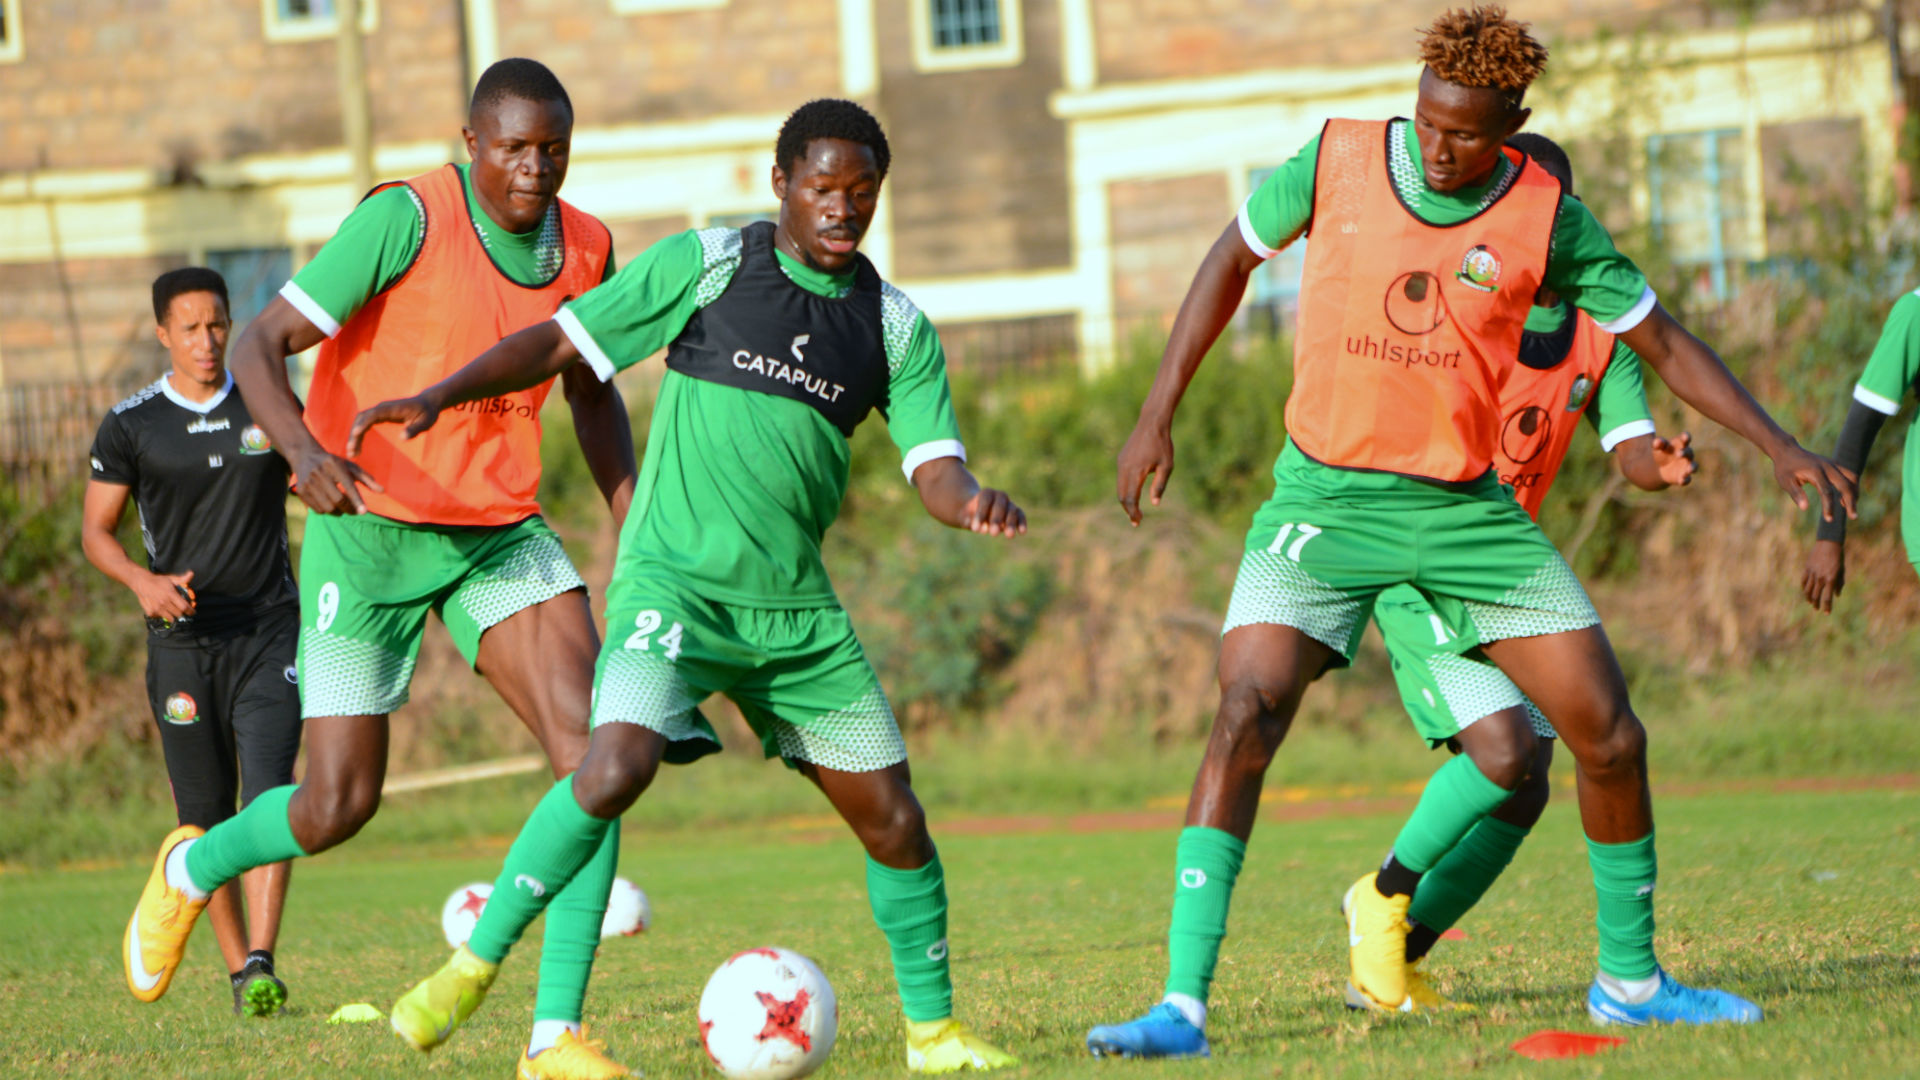 Macharia: Harambee Star confident friendlies against South Sudan & Tanzania will improve players